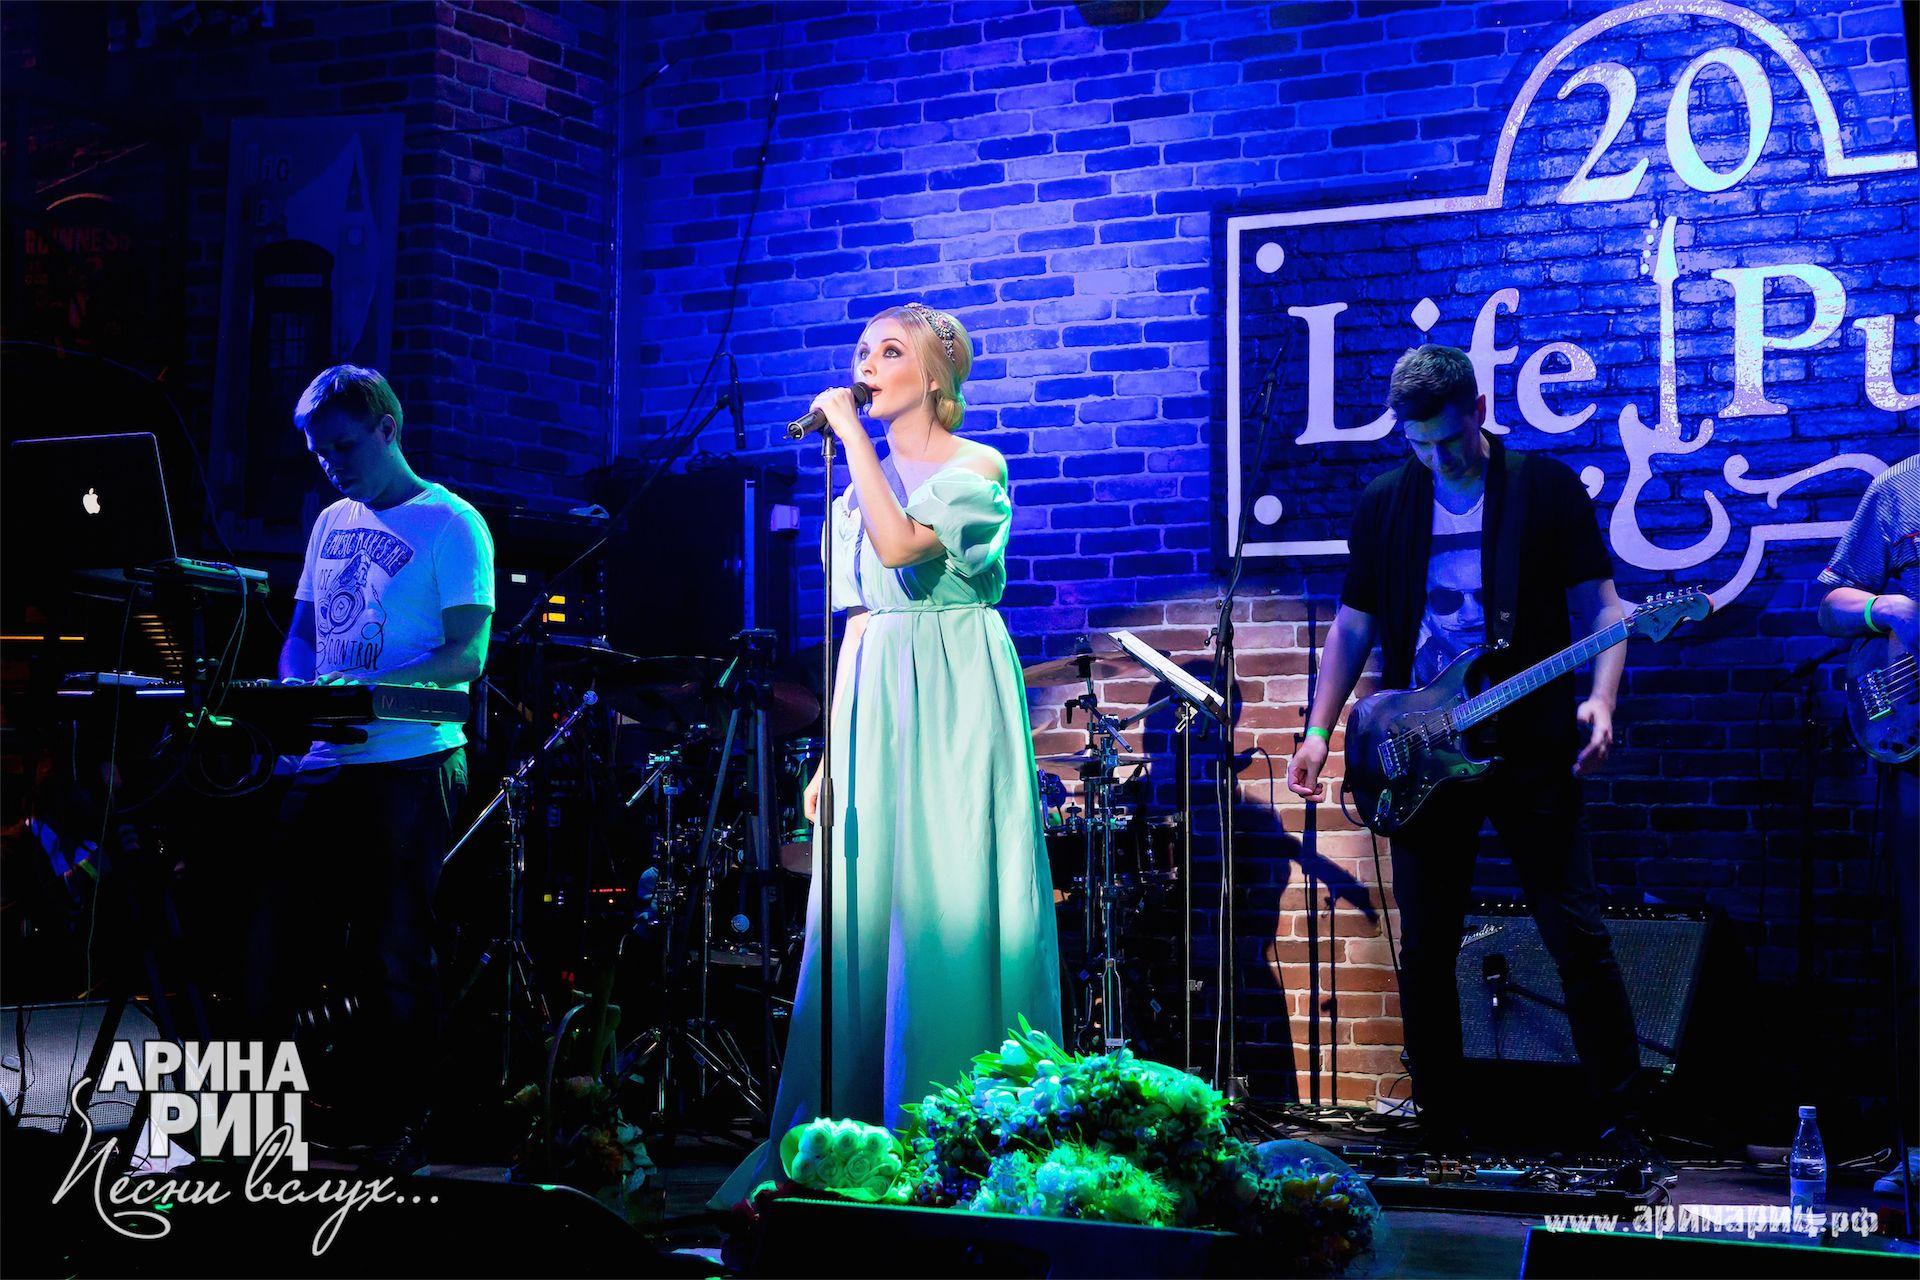 ArinaRitz_Concert014.jpg